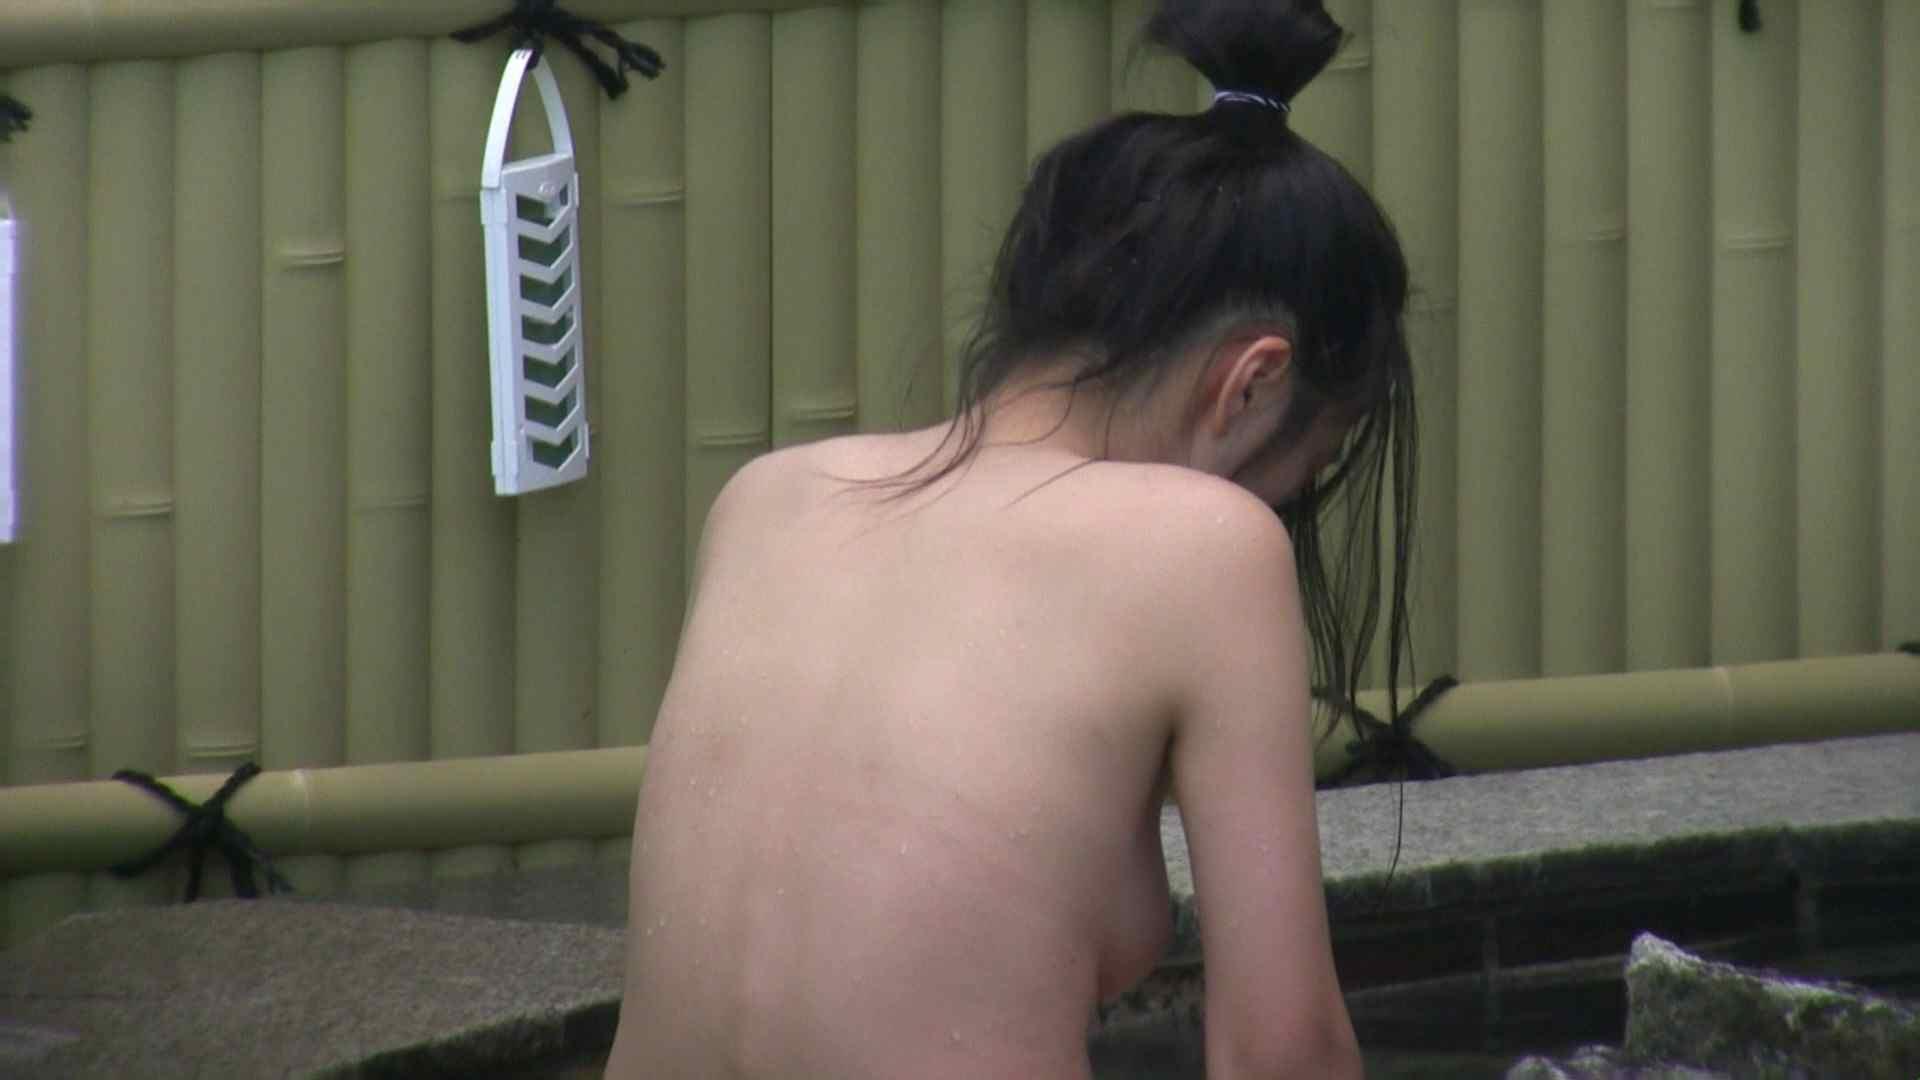 Aquaな露天風呂Vol.87【VIP限定】 盗撮 SEX無修正画像 92画像 77